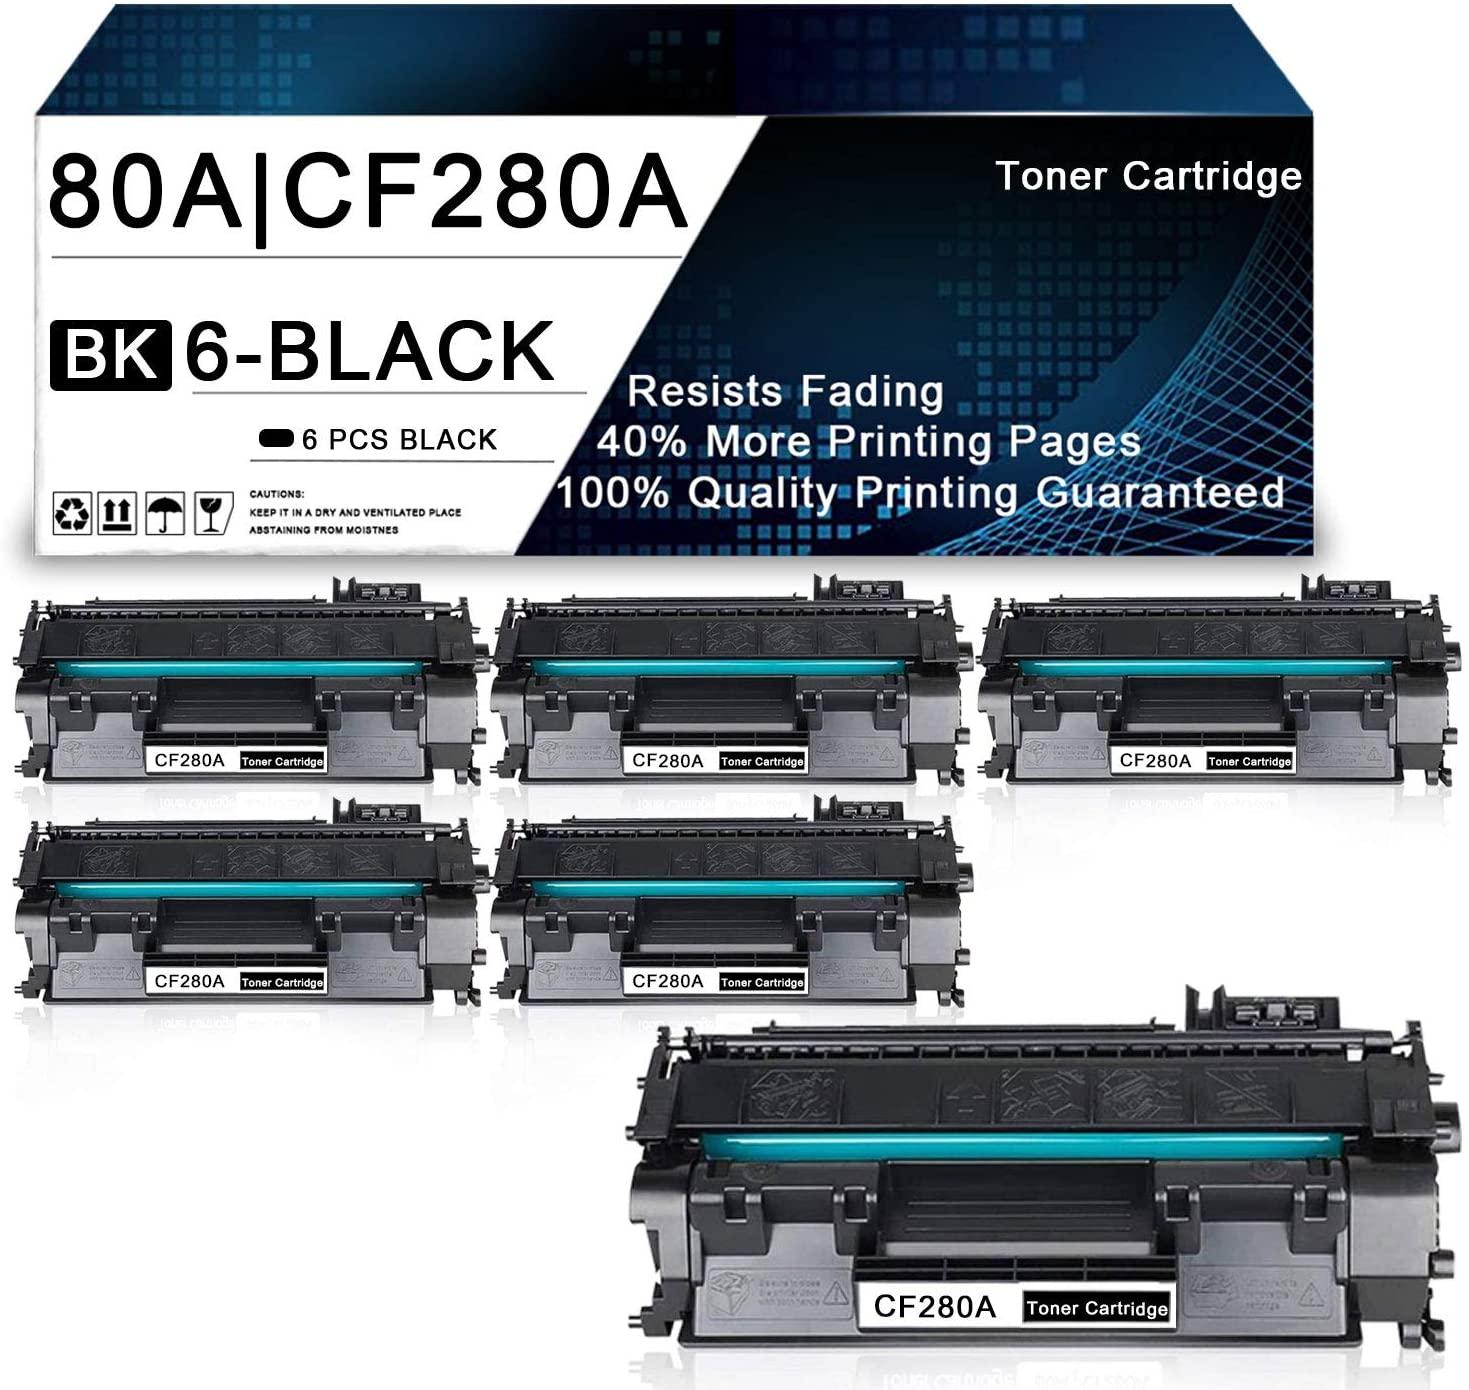 6 Pack Black 80A   CF280A Compatible Toner Cartridge Replacement for HP Laserjet Pro 400 M401n M401dw M401dne M401dn MFP M425dn Printers Toner Cartridge.